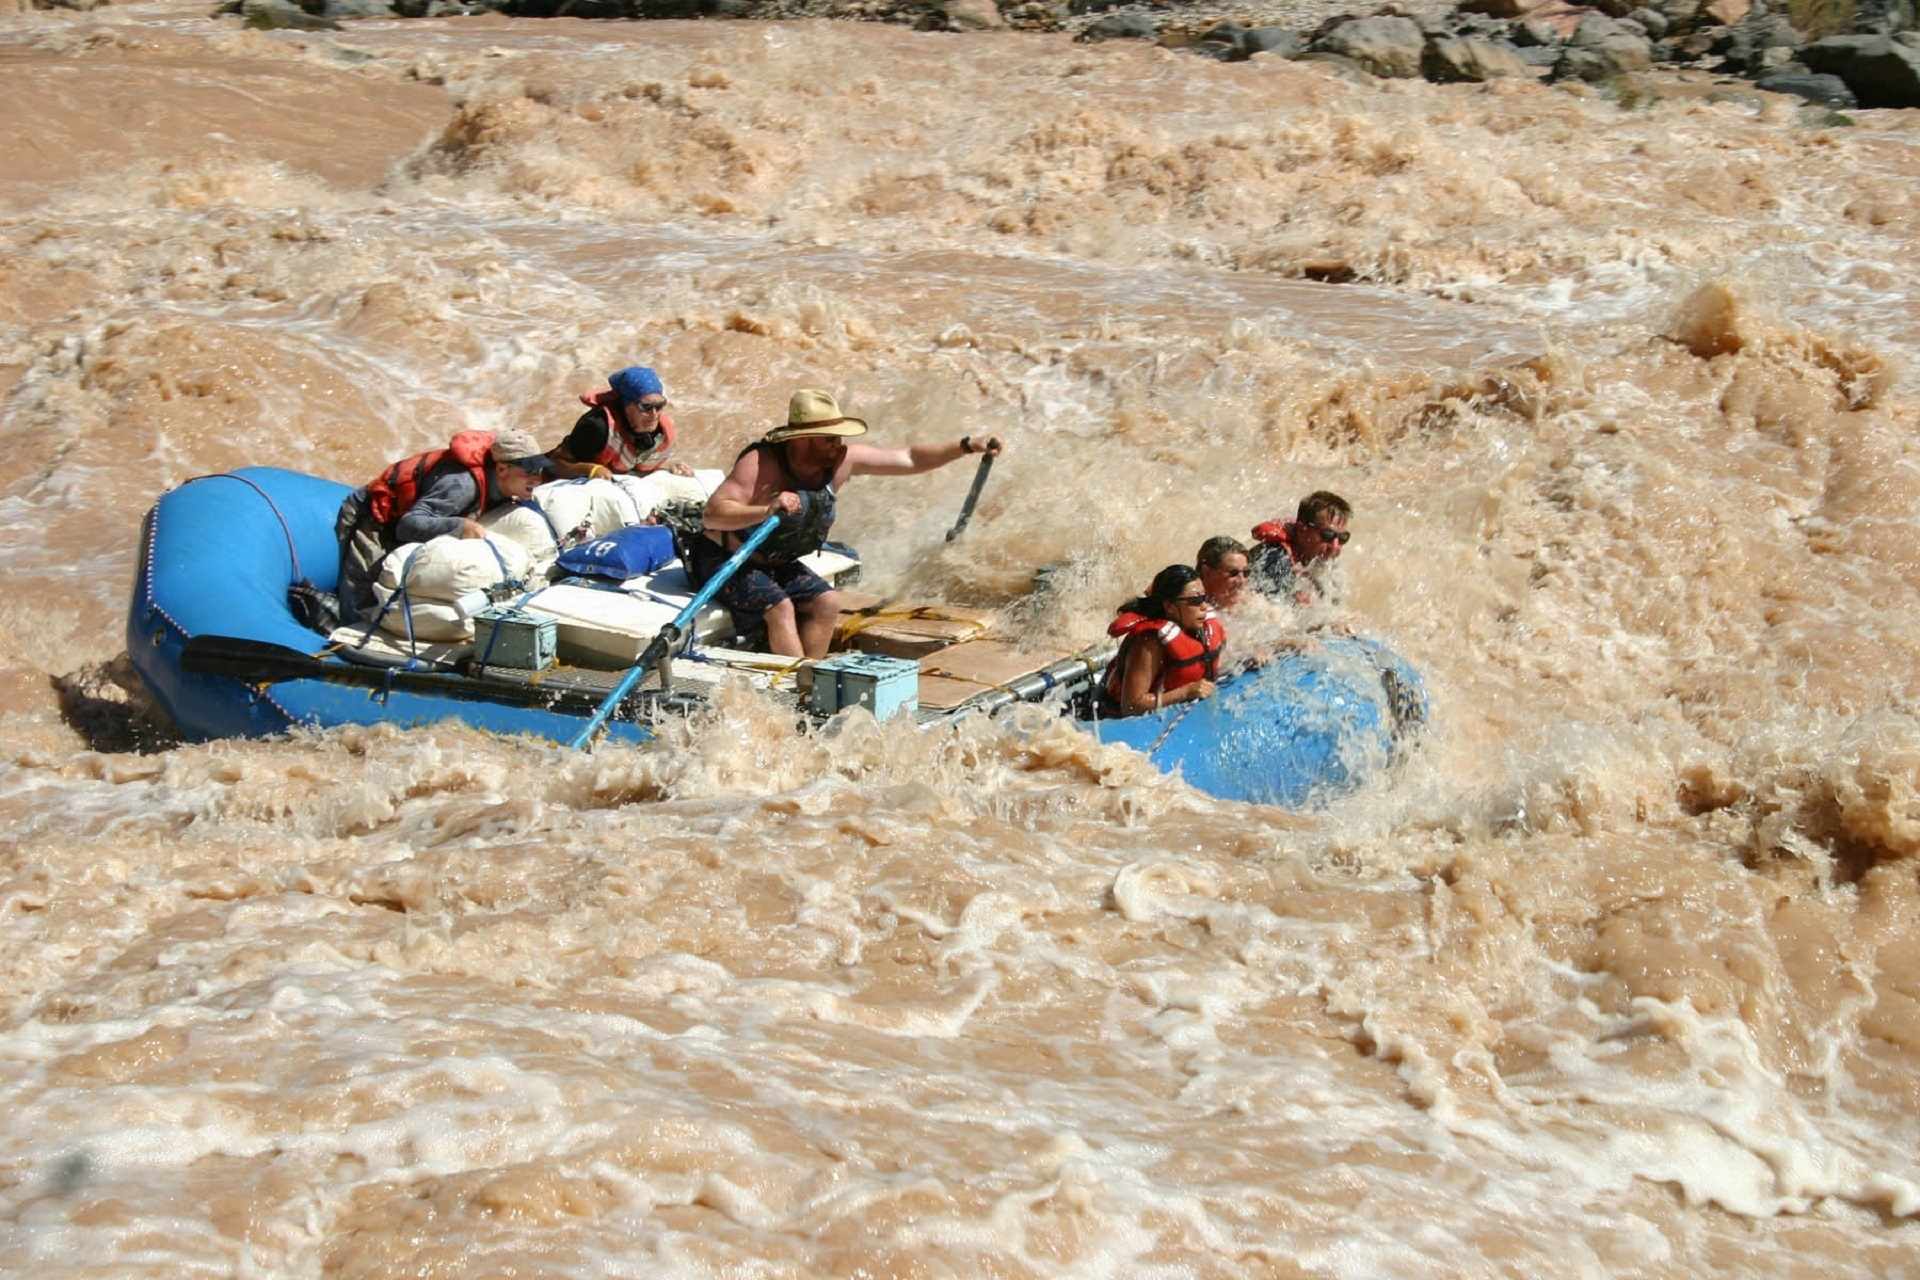 Fluss, schnell, Rafting, Colorado River, Risiko - Wallpaper HD - Prof.-falken.com